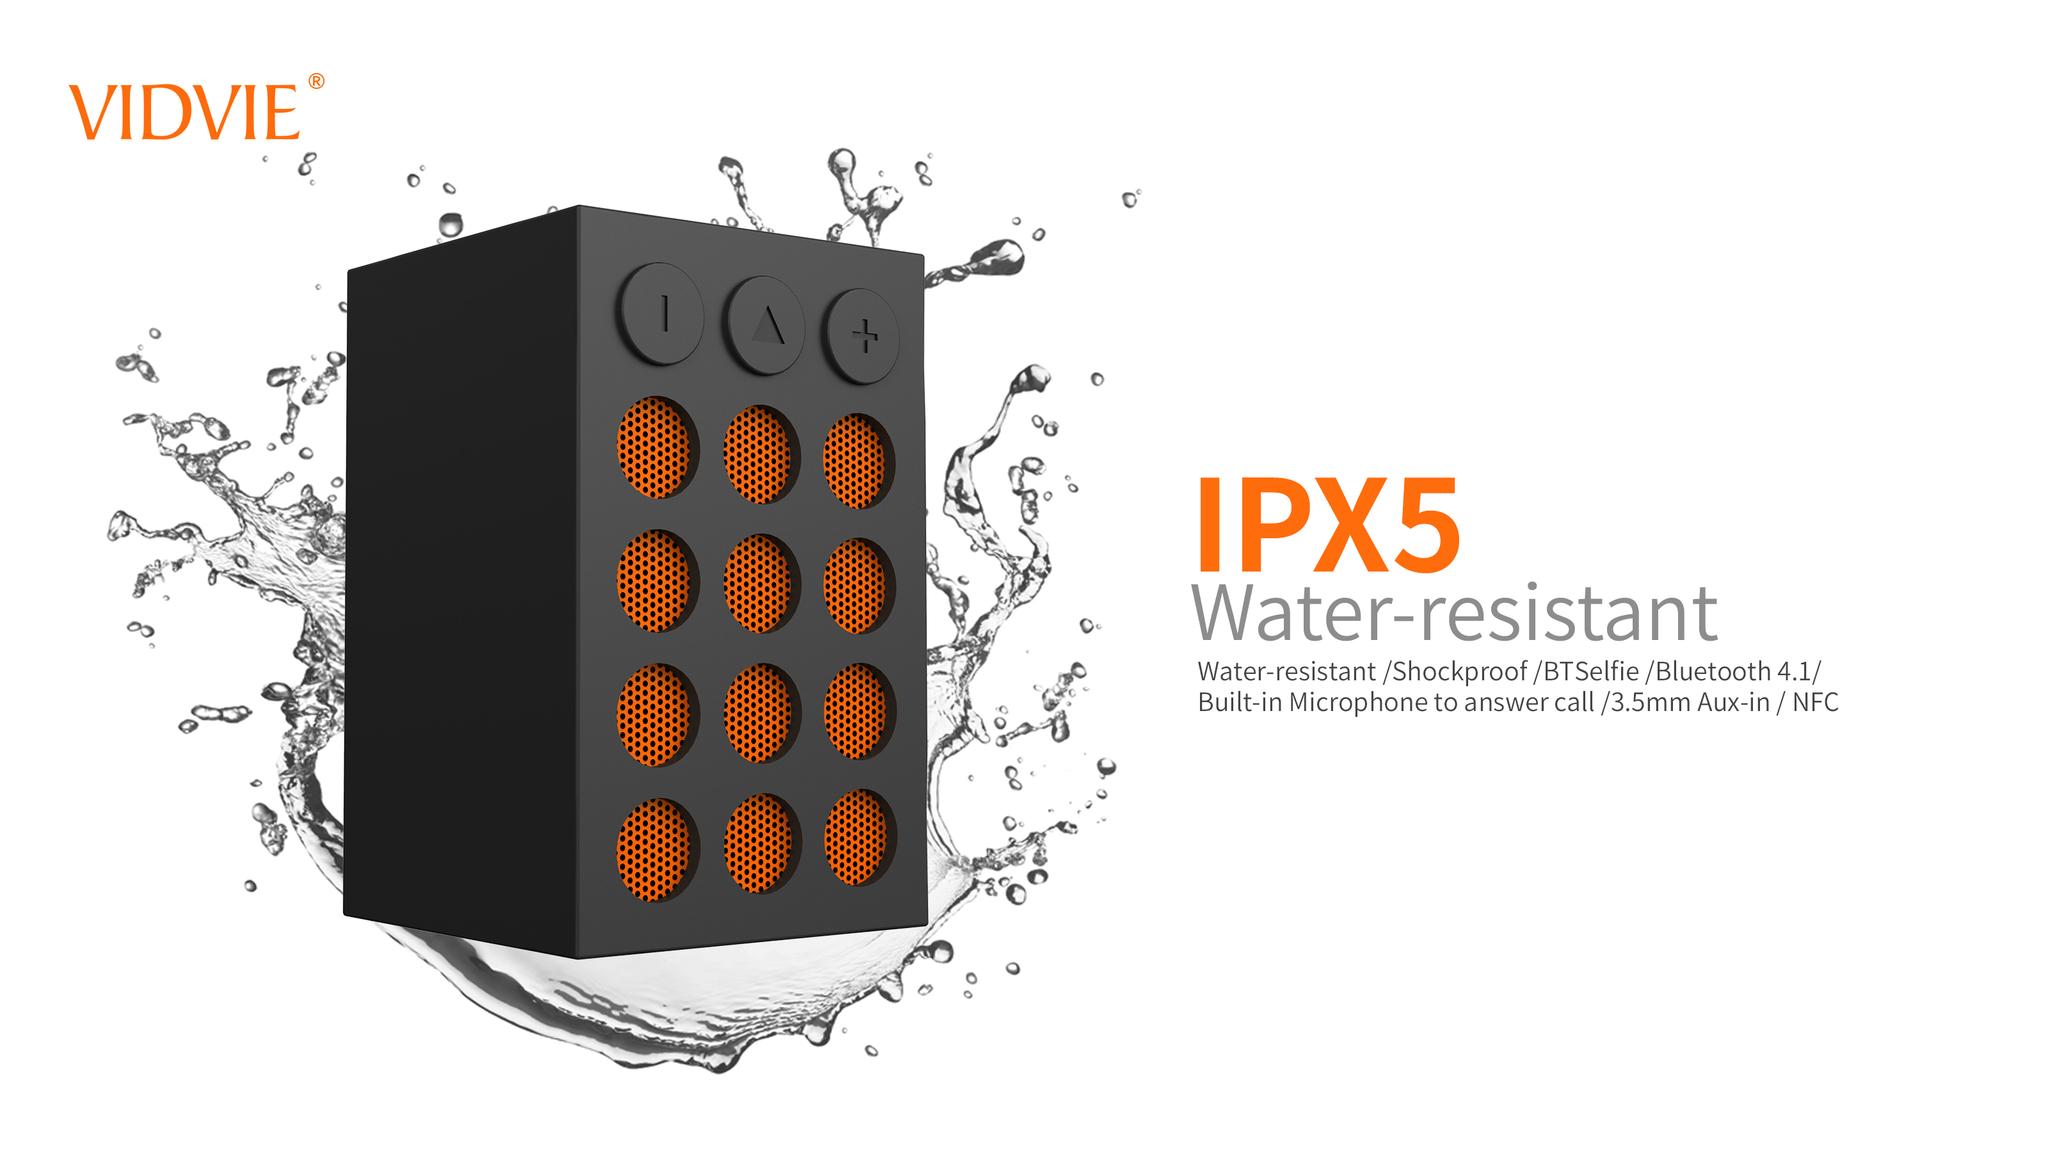 Vidvie Wireless Speaker Sp905 Bluetooth Portable Speaker Blanja